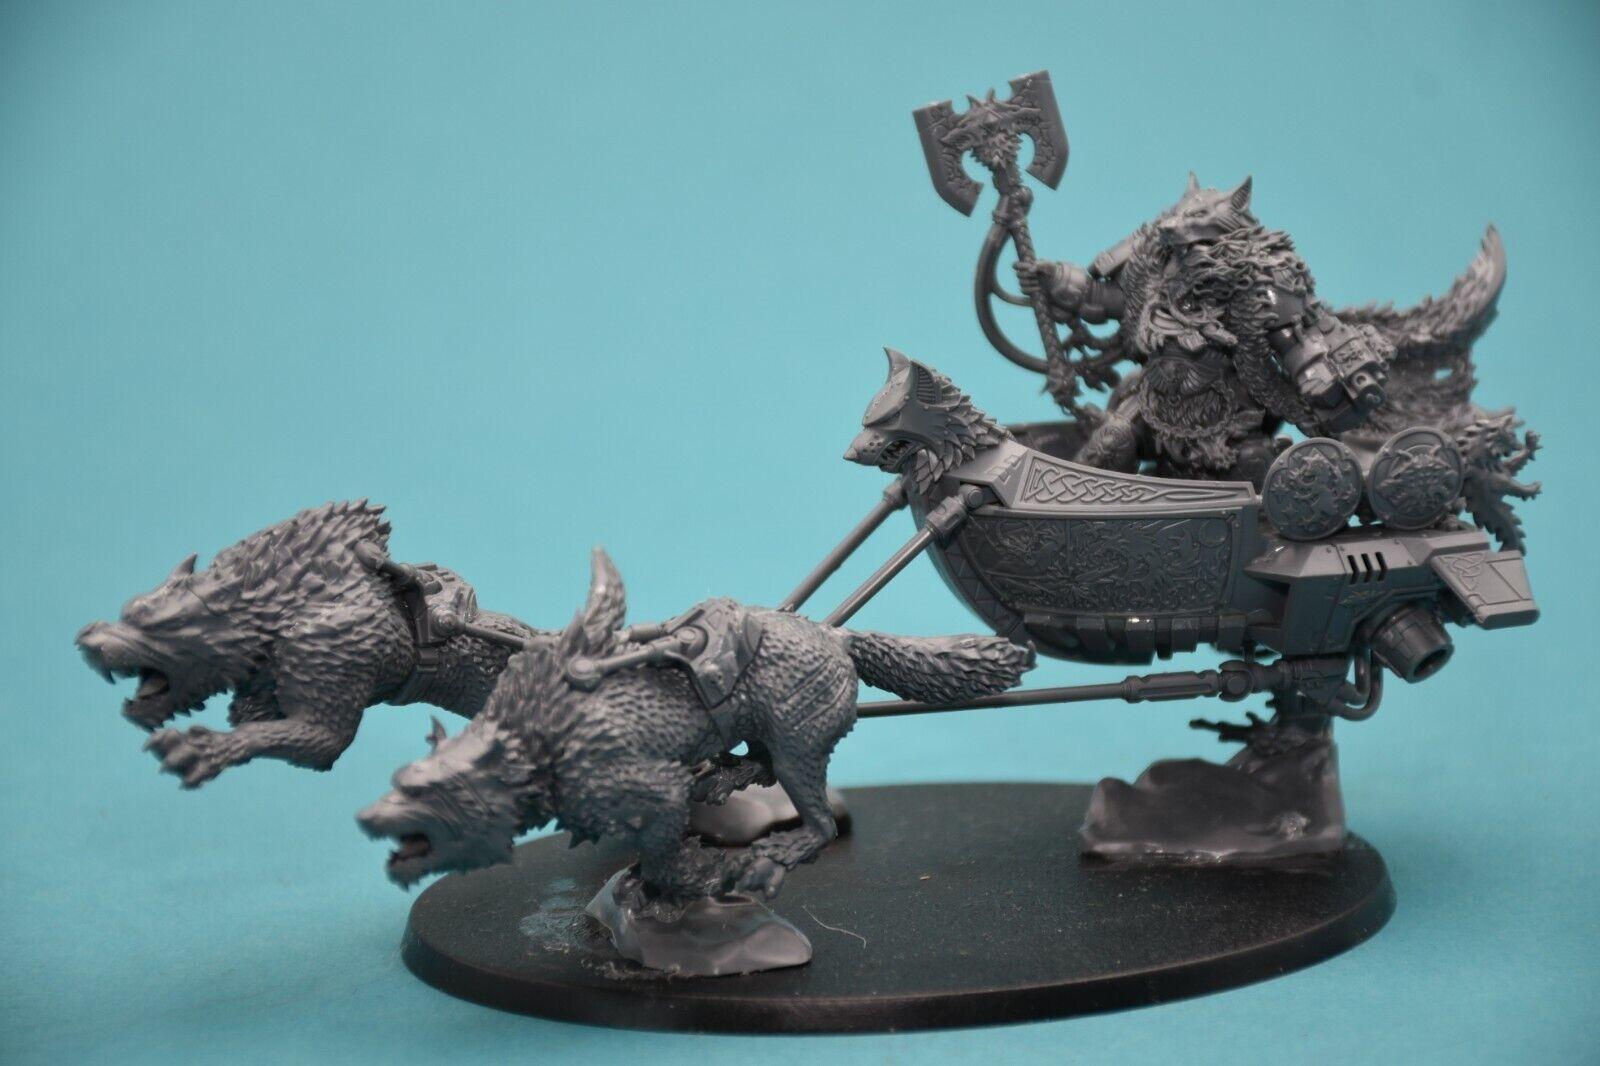 Warhammer 40k Space Wolves Logan Logan Logan Grimnar on Stormrider eec